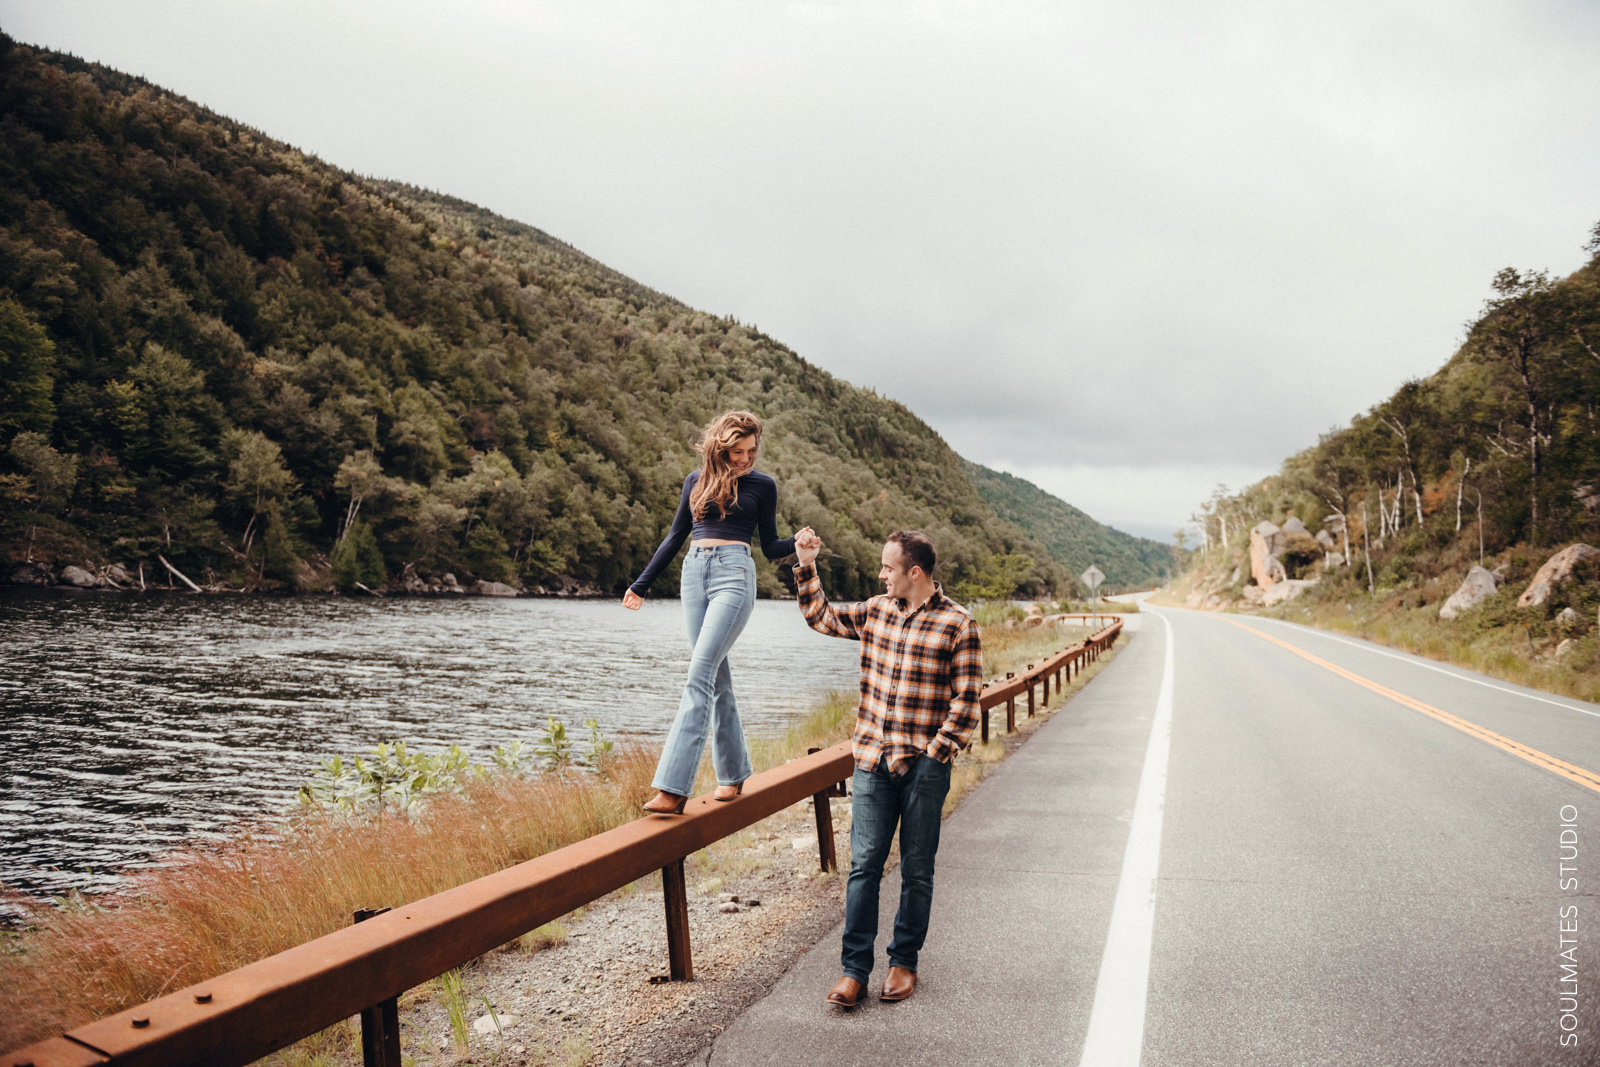 Adirondacks Destination Engagement Session Location